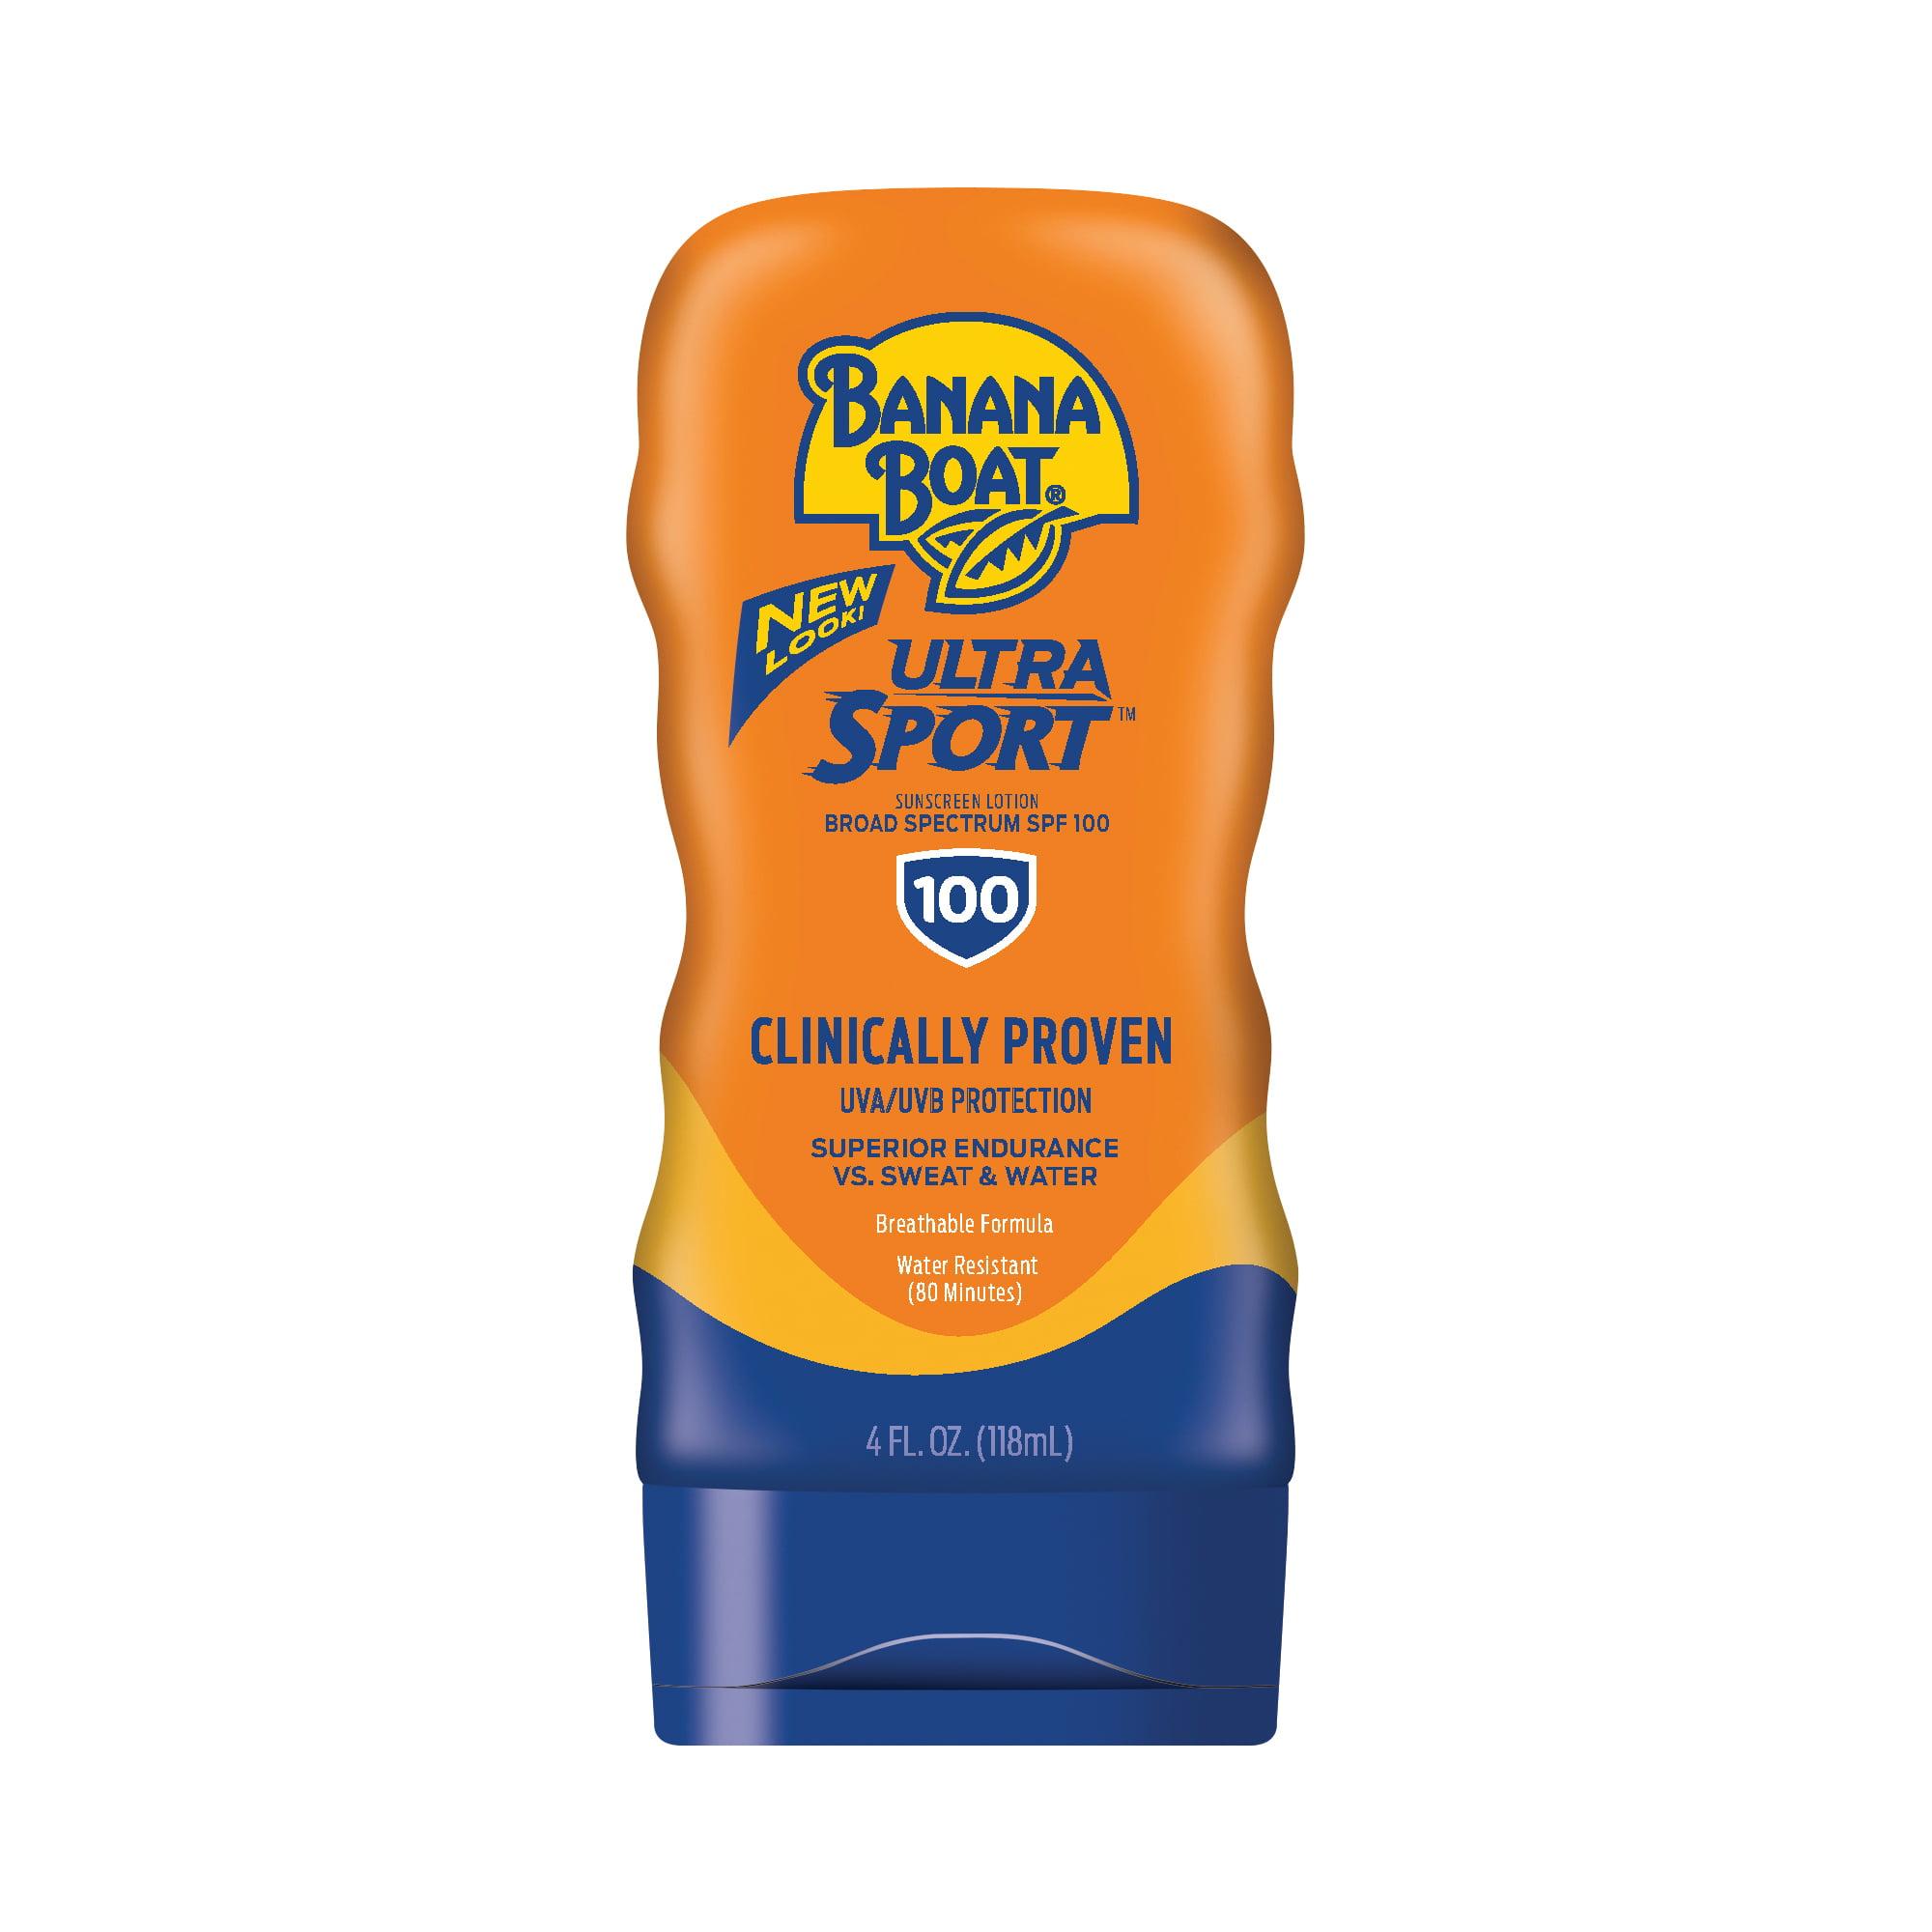 Banana Boat Ultra Sport Sunscreen Lotion SPF 100, 4 Oz, Packaging May Vary